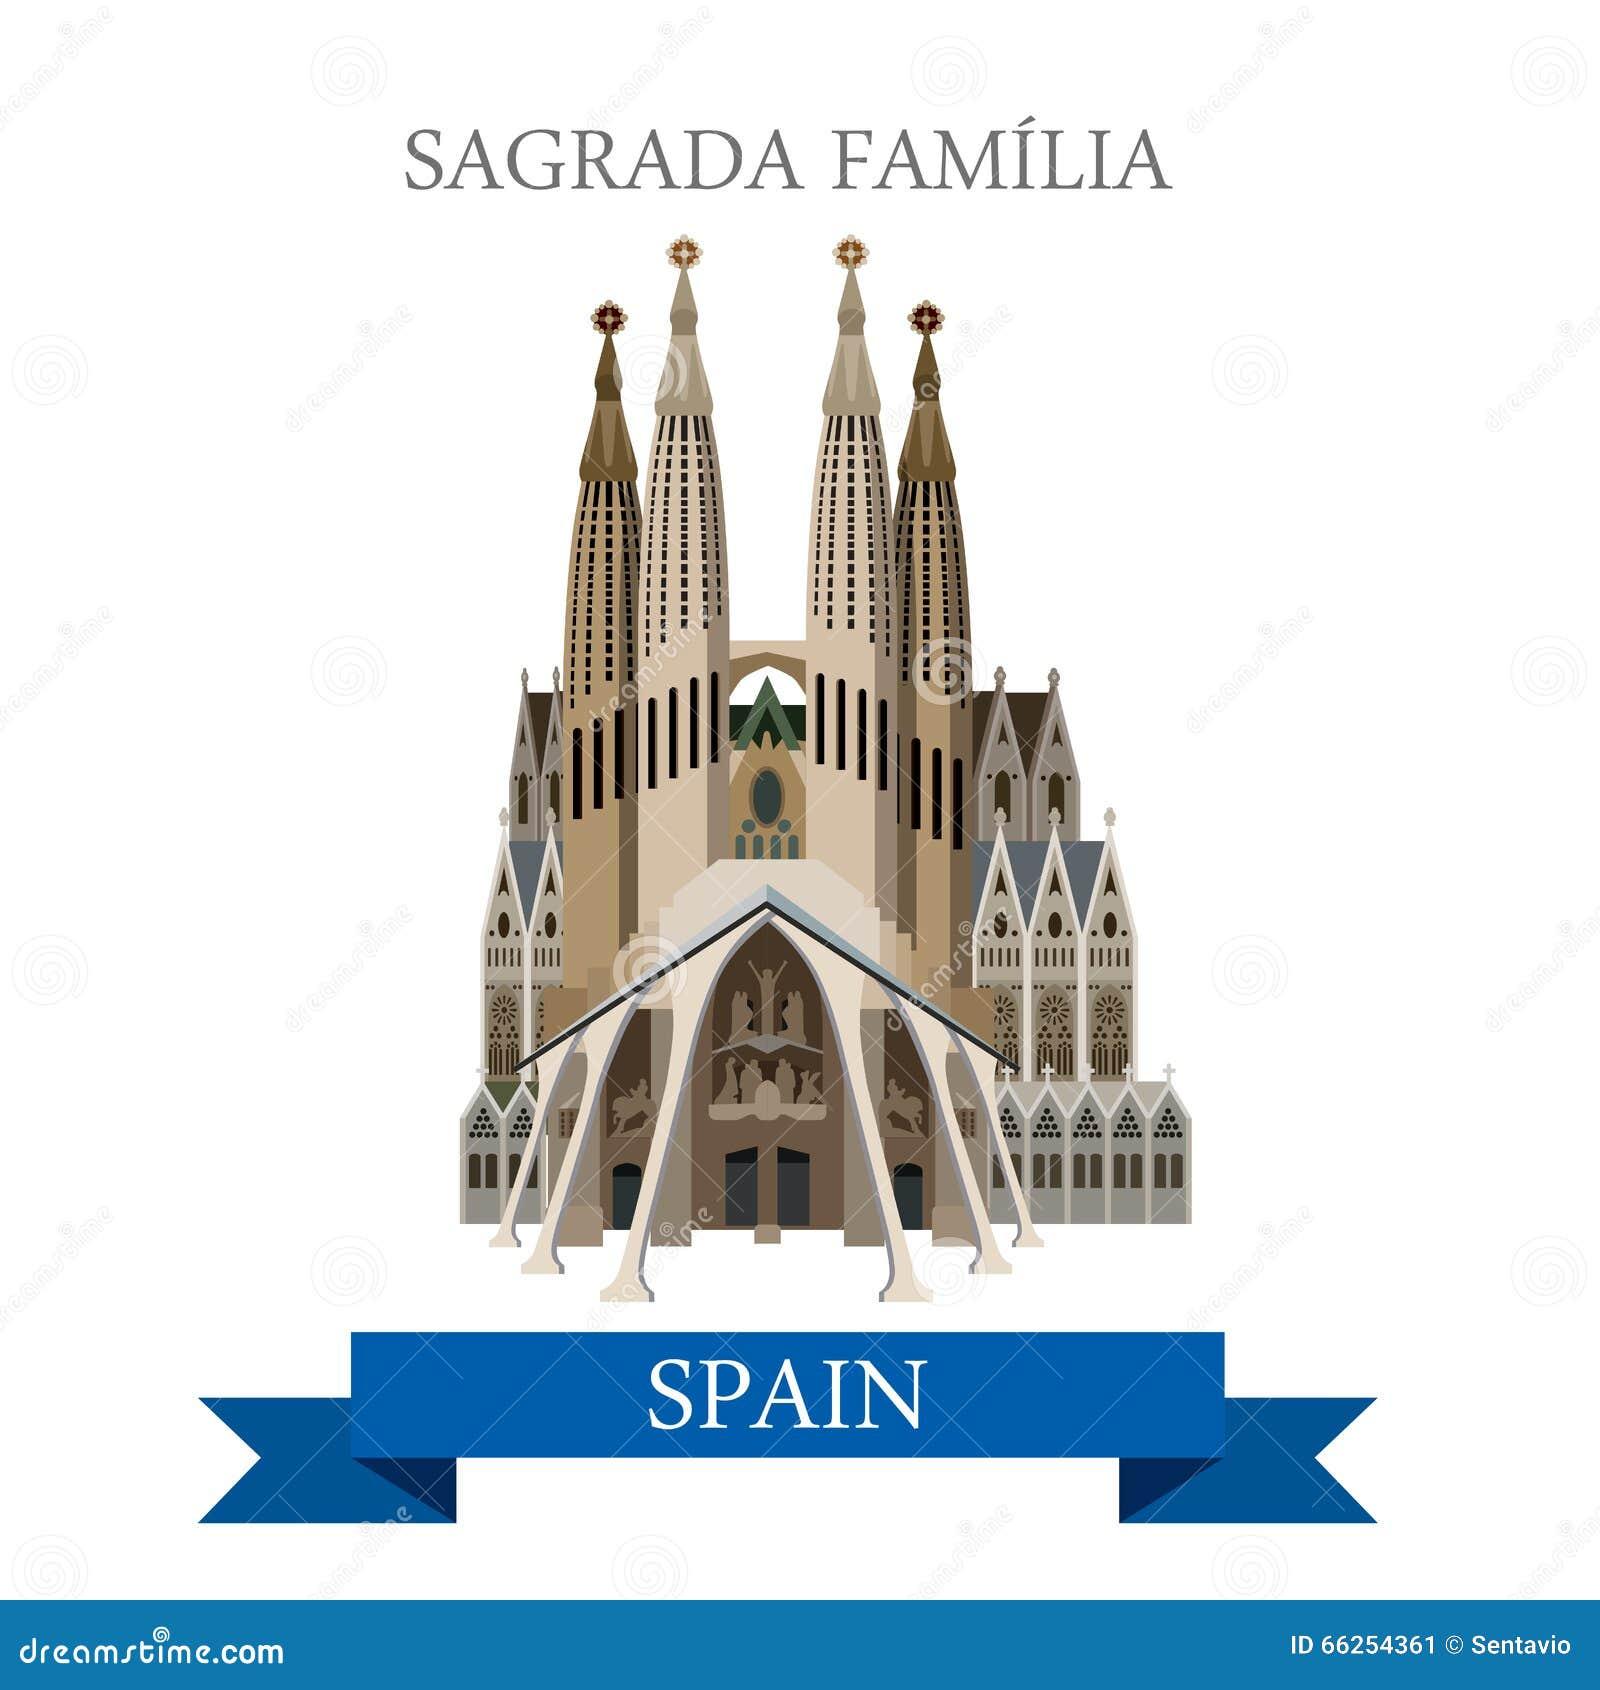 Sagrada Familia Gaudi Basilica Barcelona Spain Flat Vector